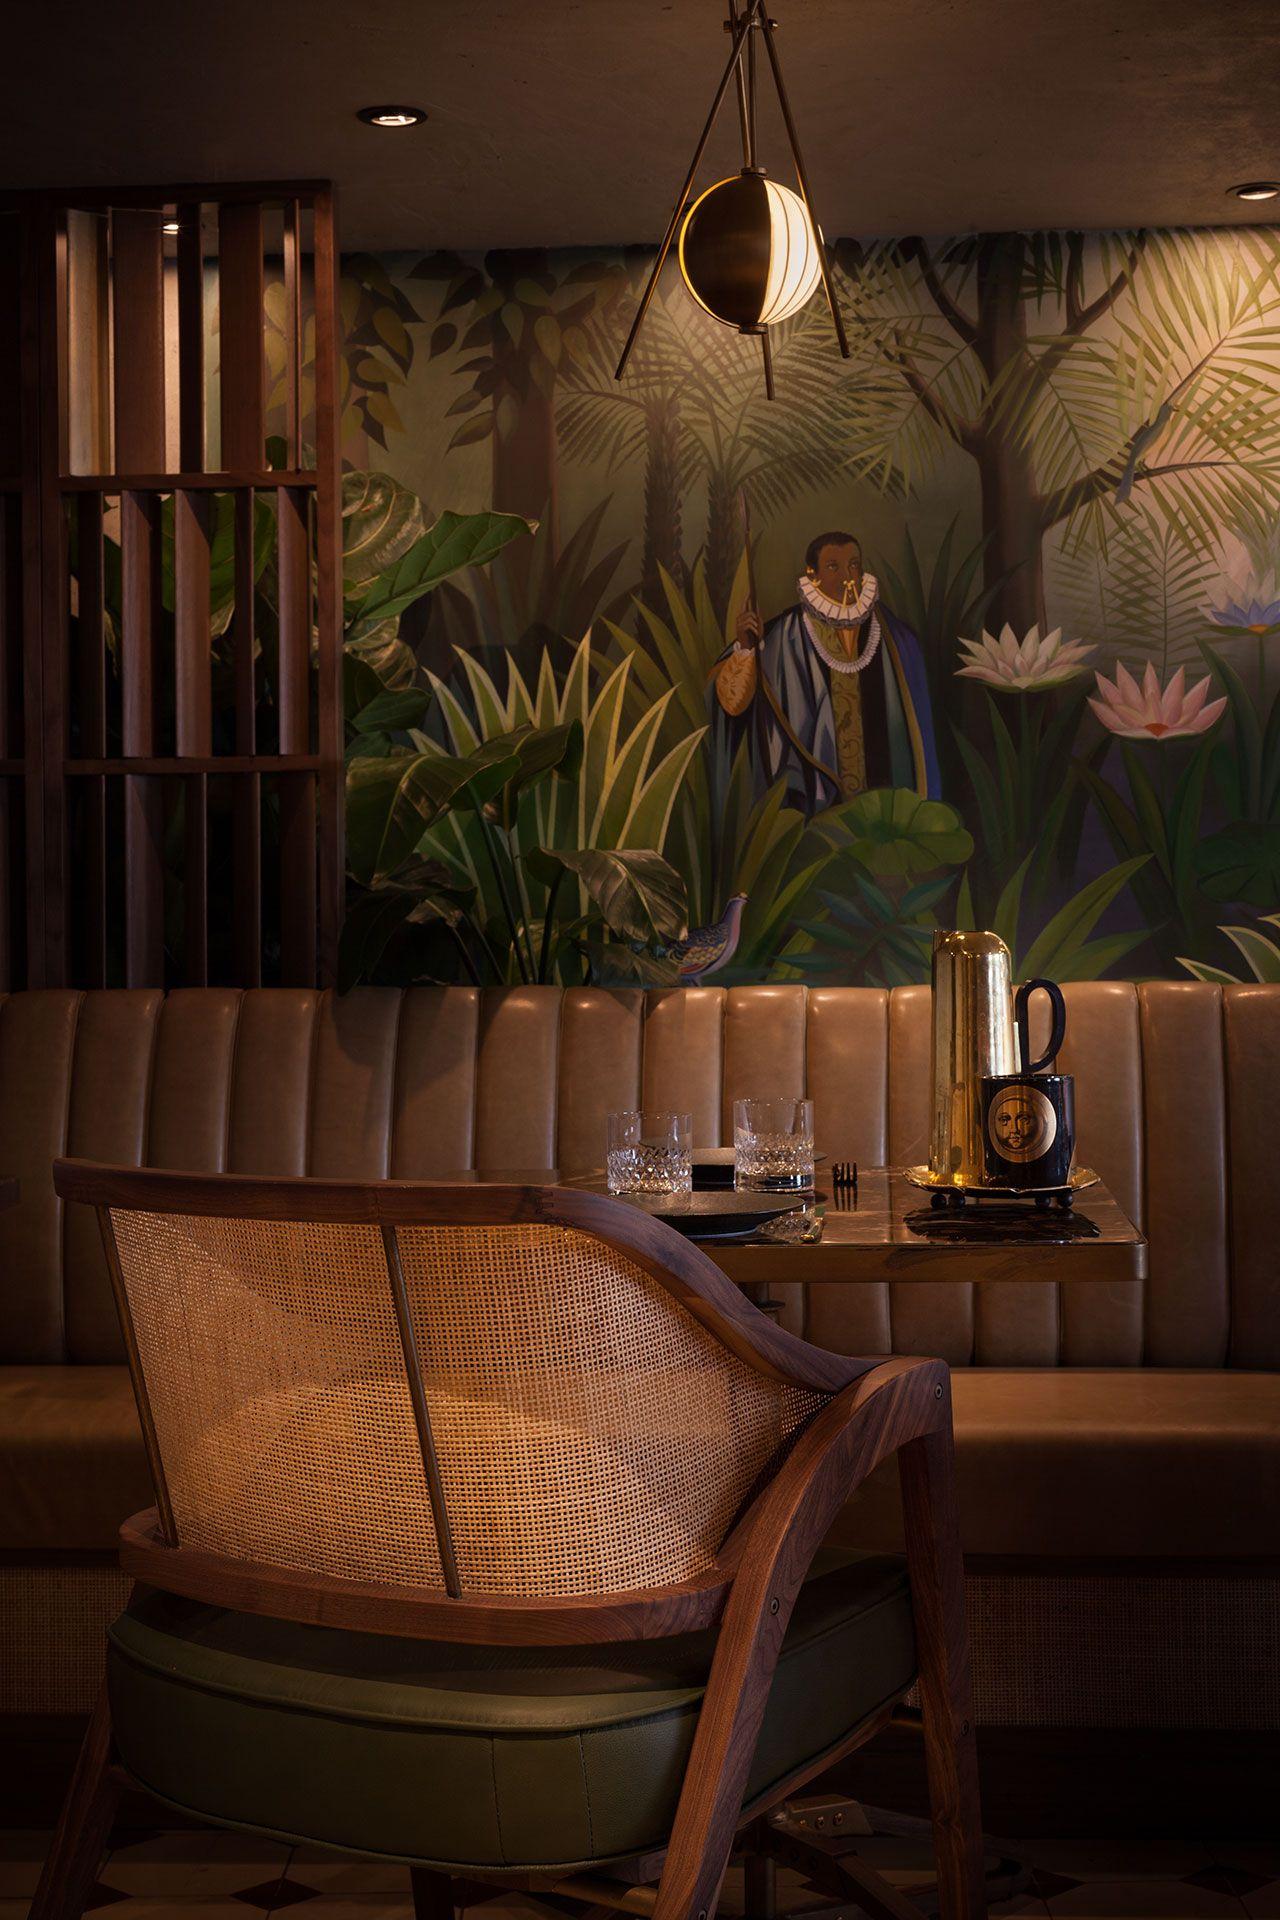 Jungle Expedition Paradis Restaurant In Hong Kong By Substance Bar DesignRestaurant InteriorsBar Design AwardsBar